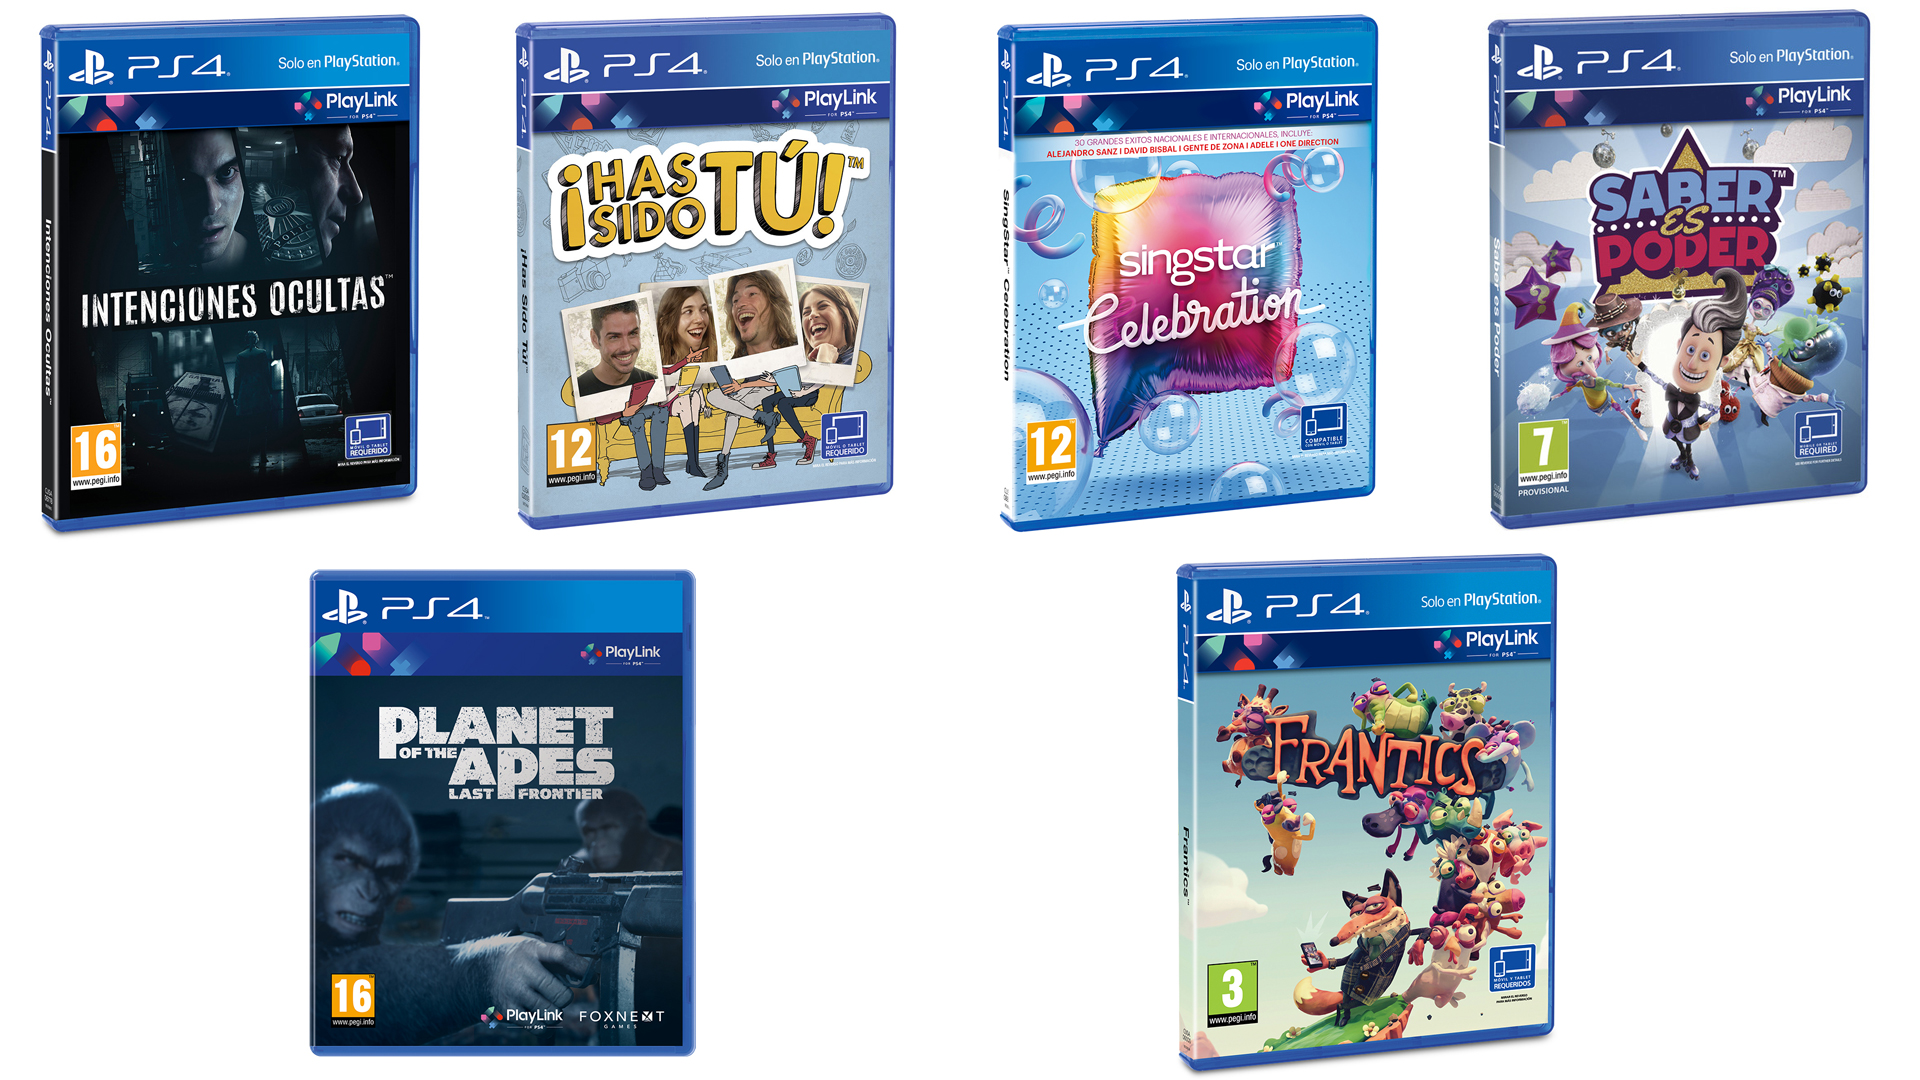 http://www.idgtv.es/archivos/201803/playstation-playlink-juegos.jpg